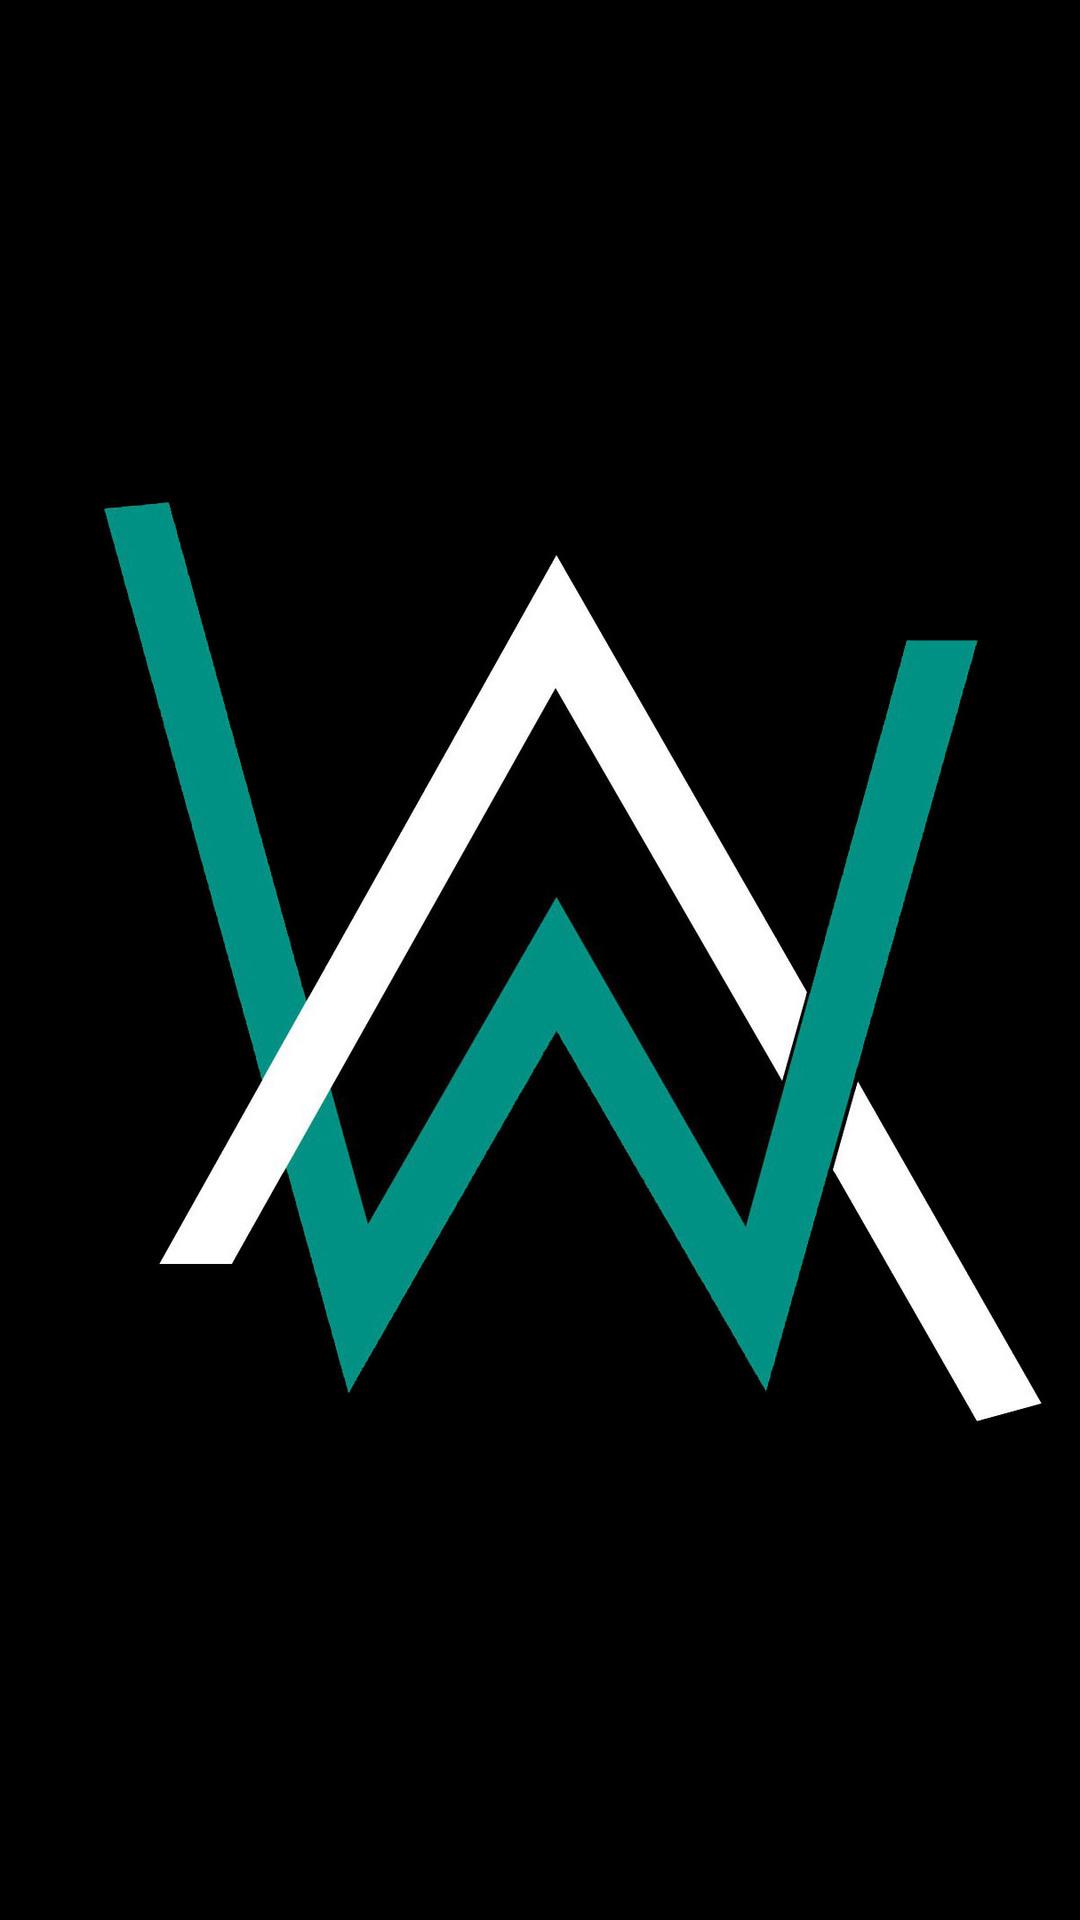 alan-walker-logo-4k-qhd.jpg